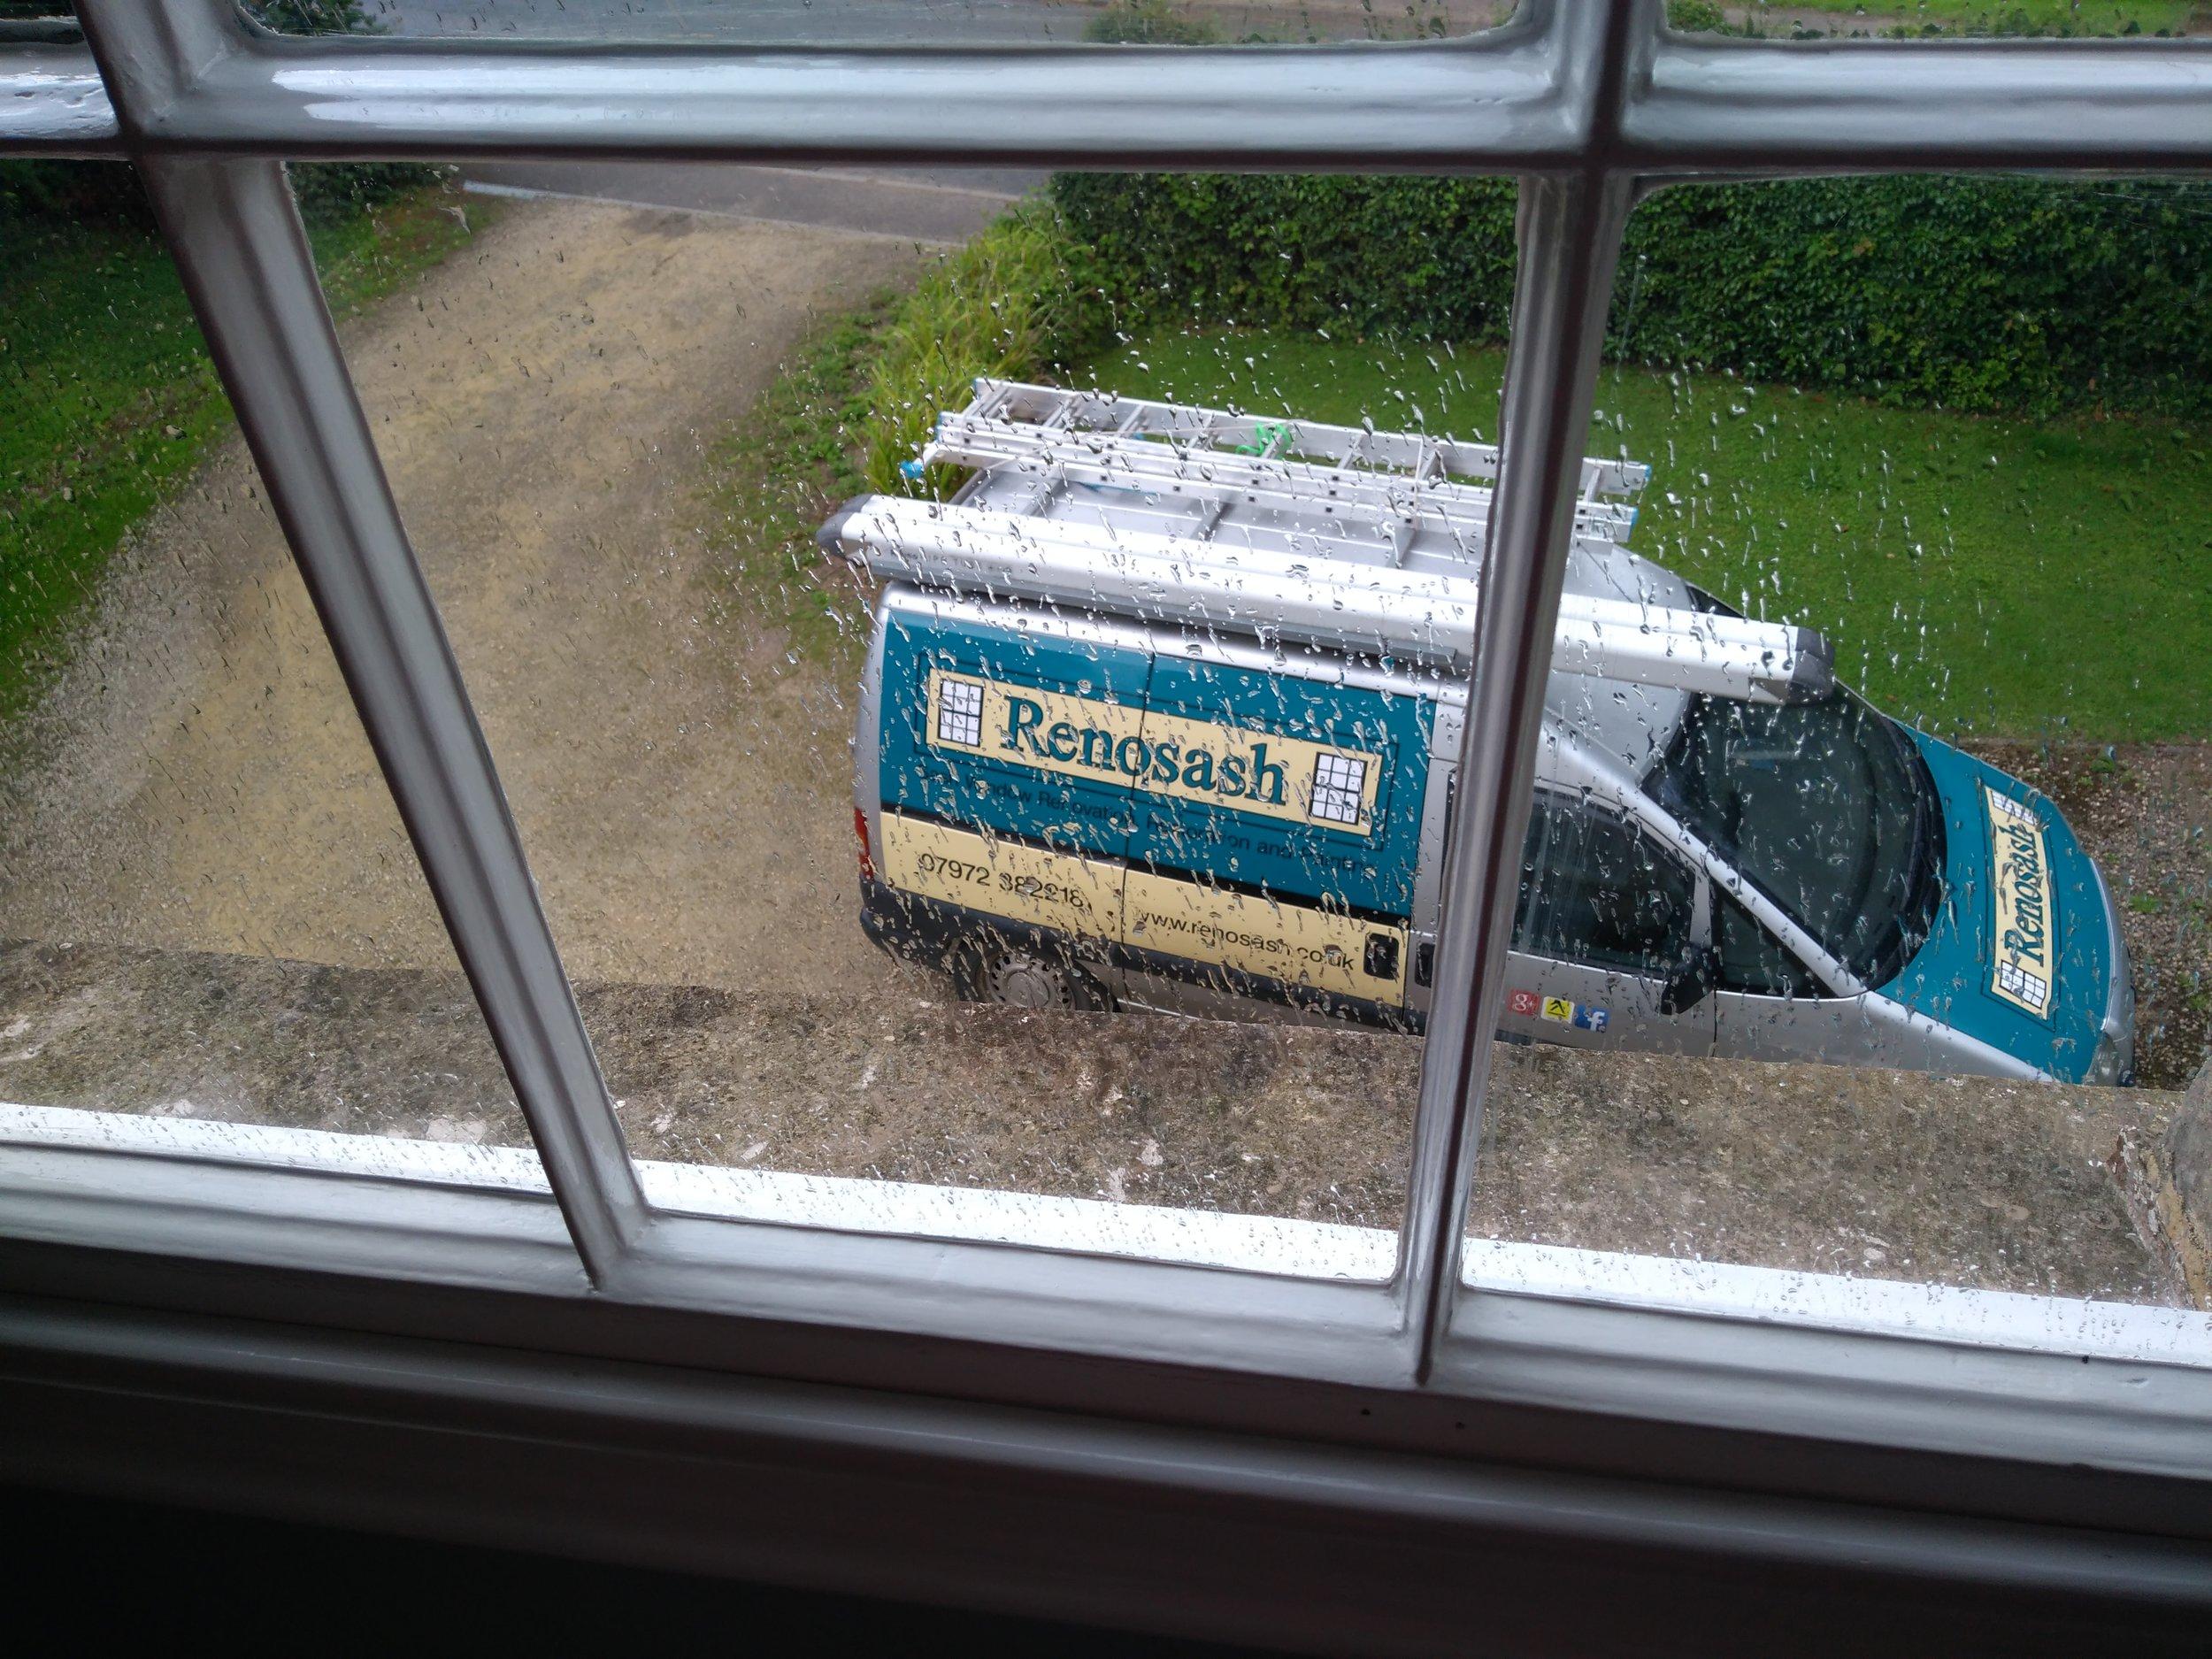 Sash Window Stroud, Gloucestershire